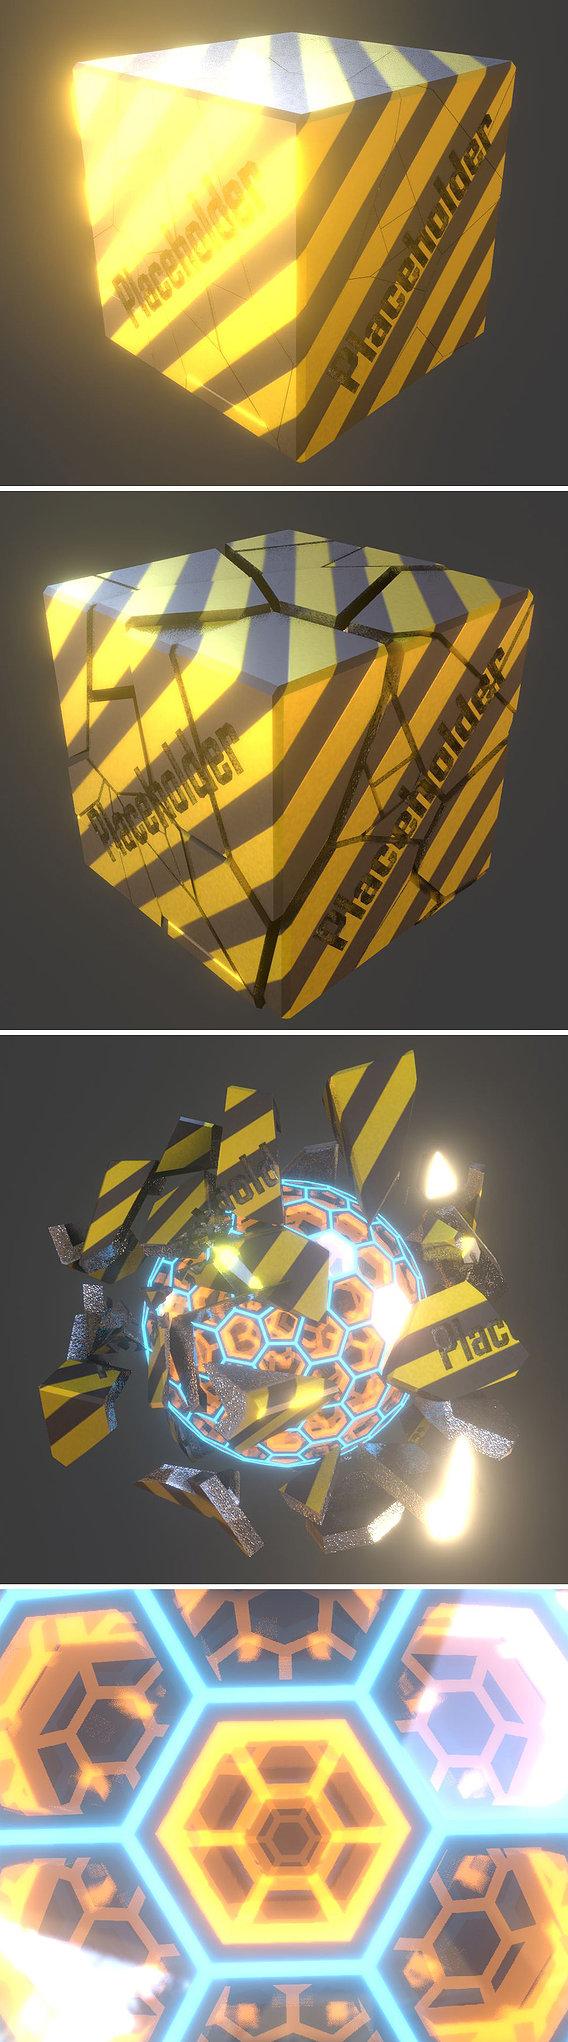 Placeholder Cube Version 1